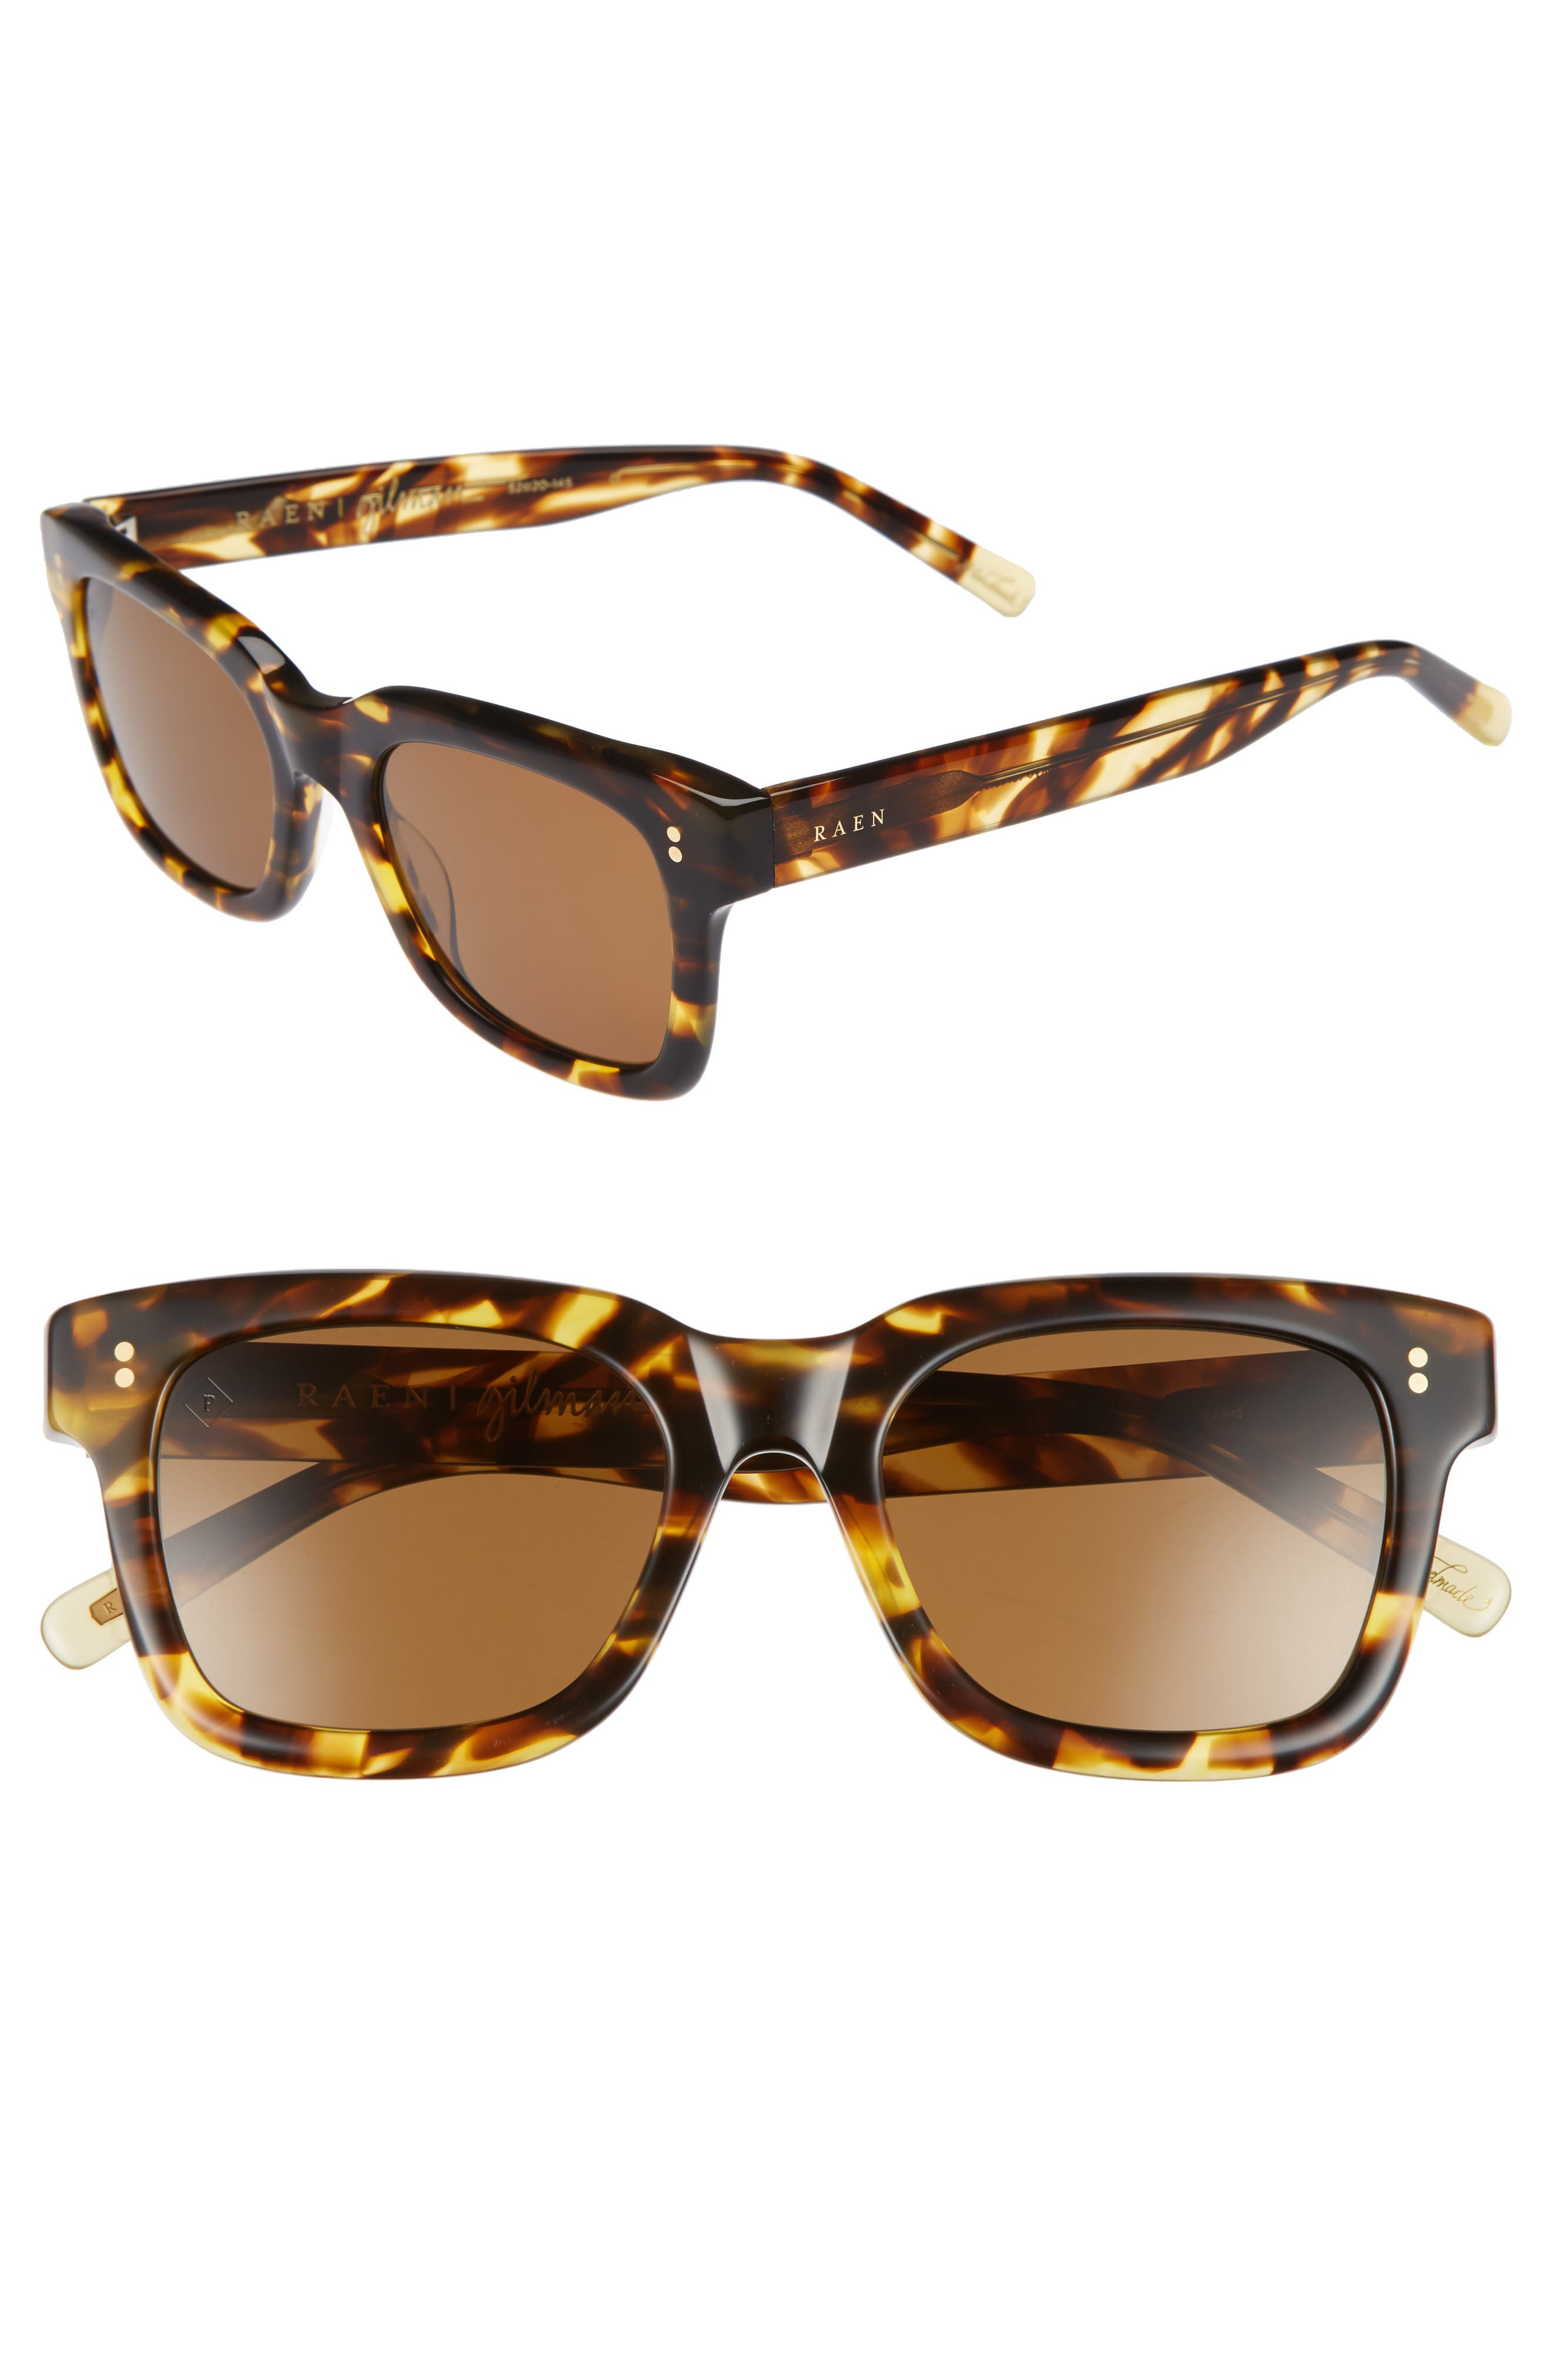 Gilman 52mm Polarized Sunglasses,                         Main,                         color, TOKYO TORTOISE/ BROWN